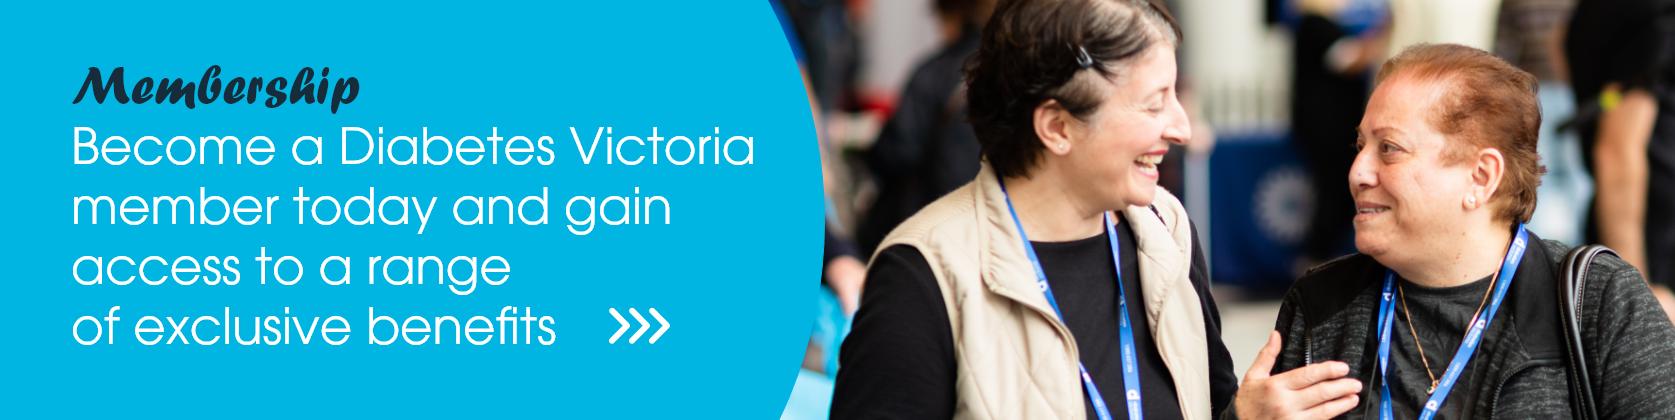 Diabetes Victoria Membership